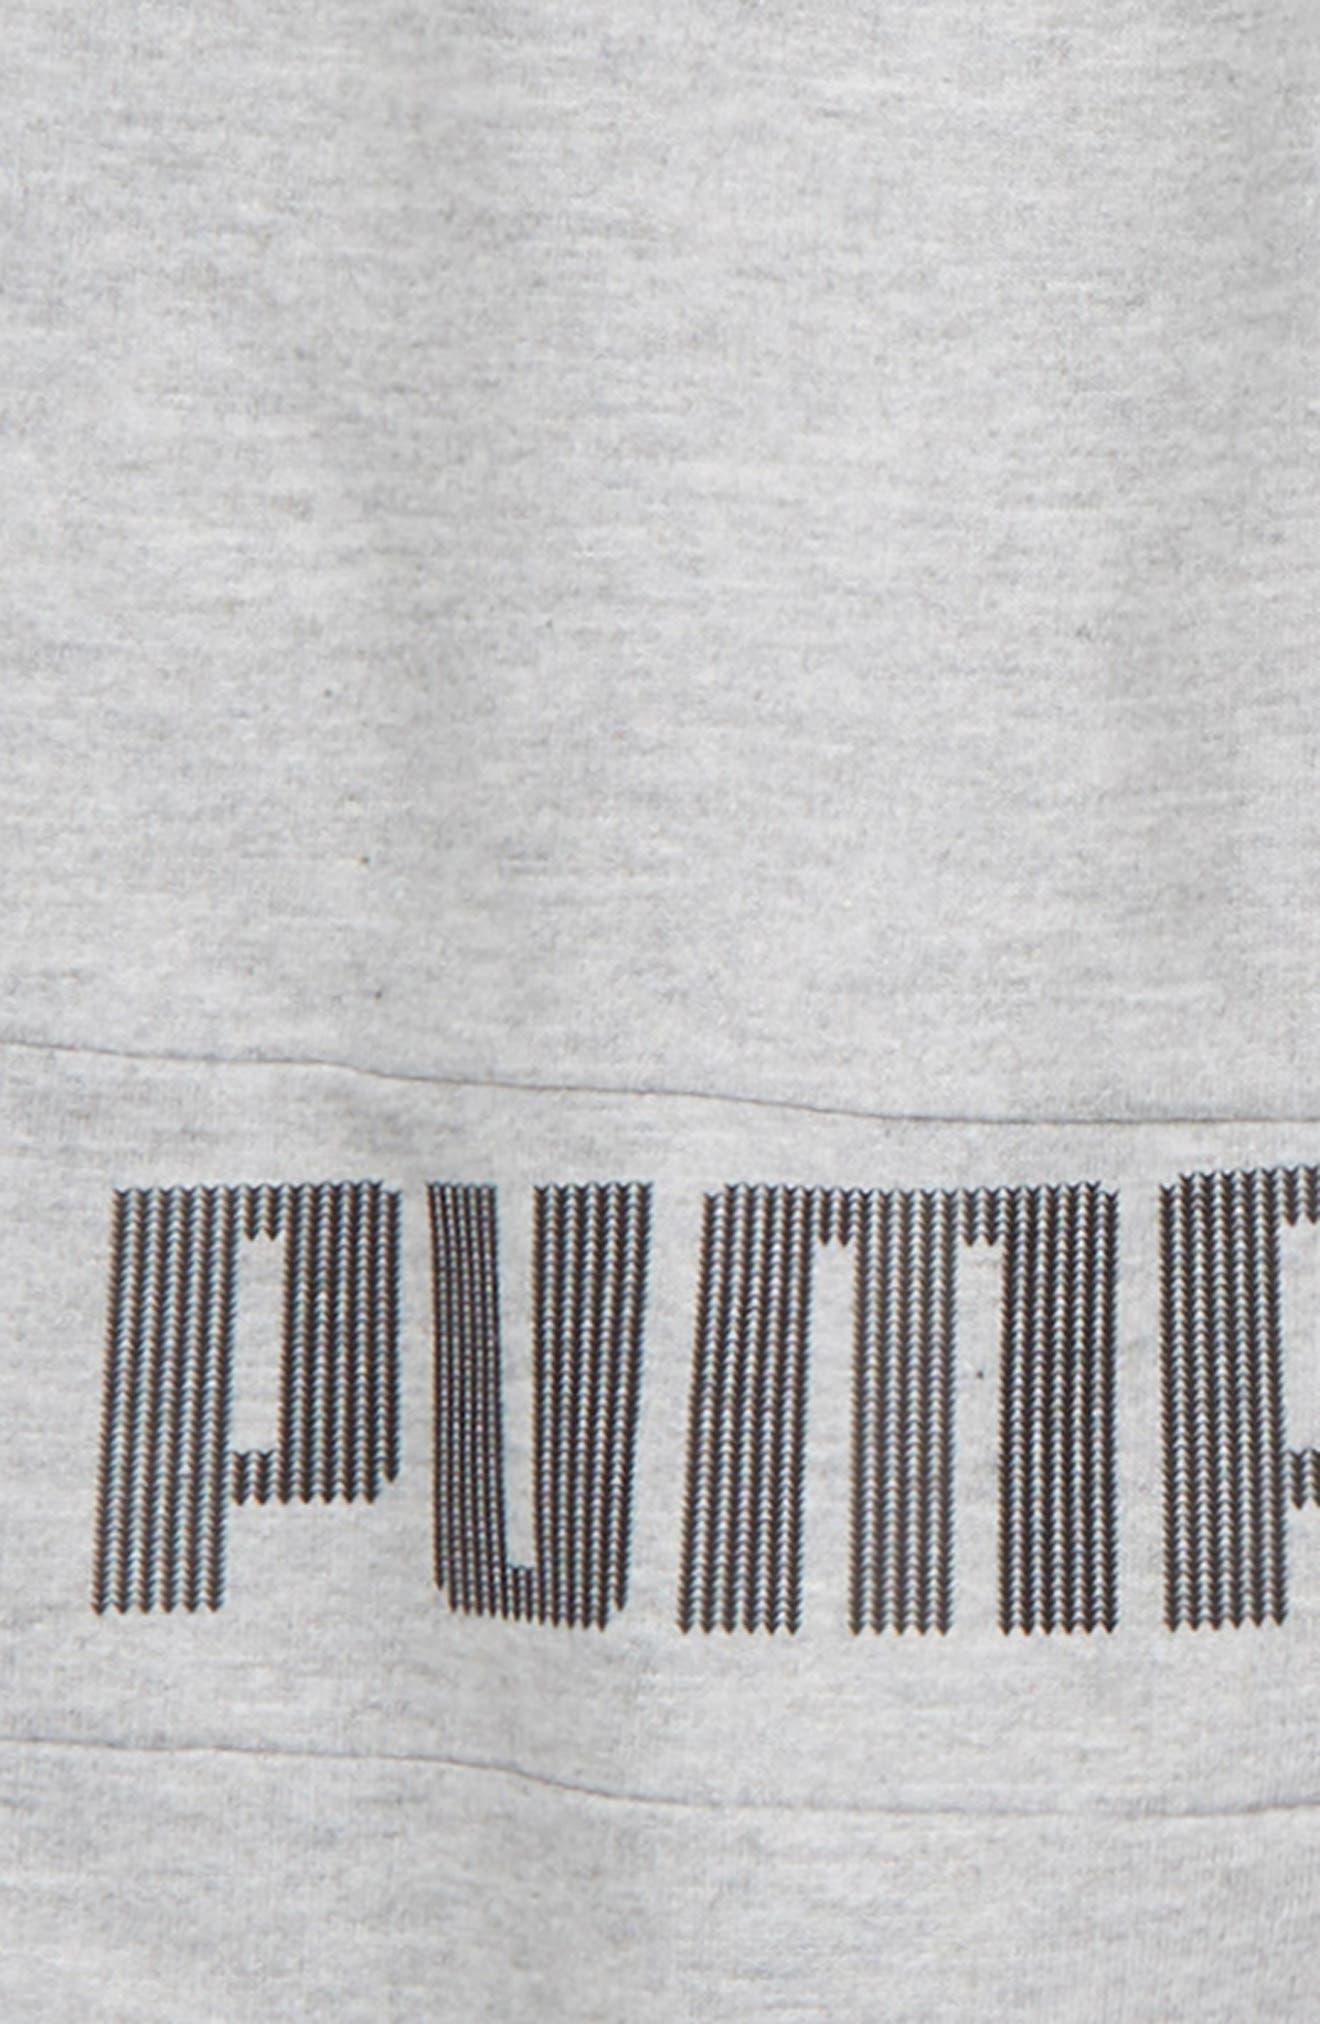 PUMA,                             Fleece Jogger Pants,                             Alternate thumbnail 3, color,                             HEATHER GREY